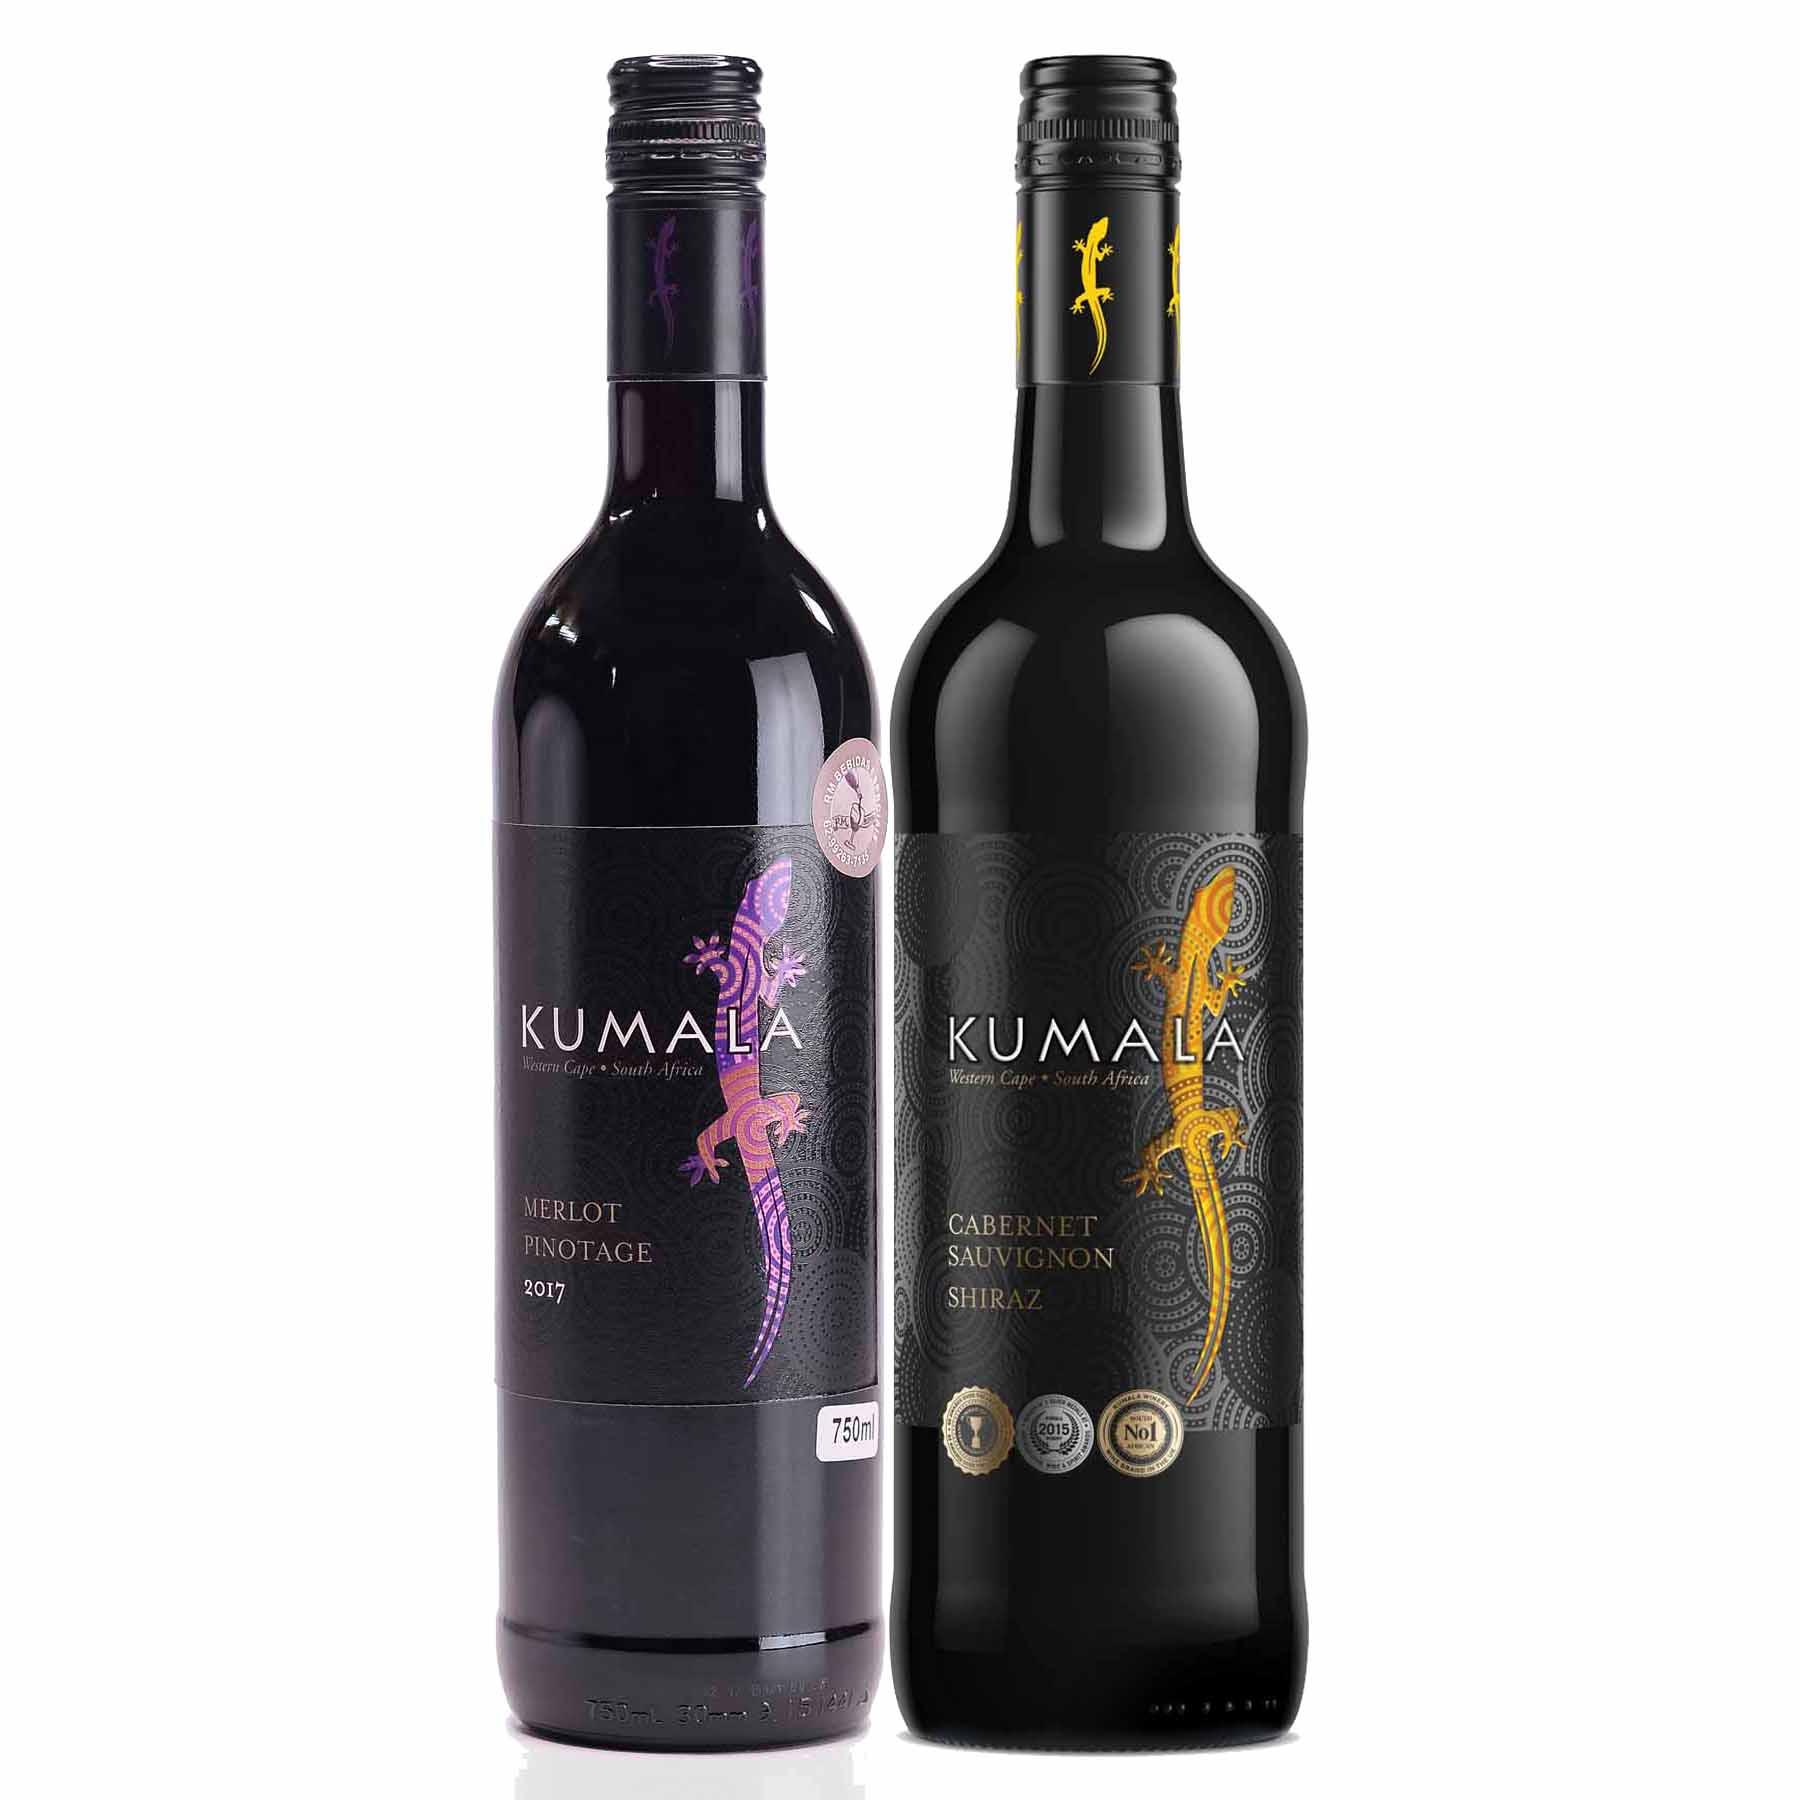 Kit 2x Vinho Tinto Sul Africano Kumala Merlot/Pinotage e Cabernet/Shiraz 2019